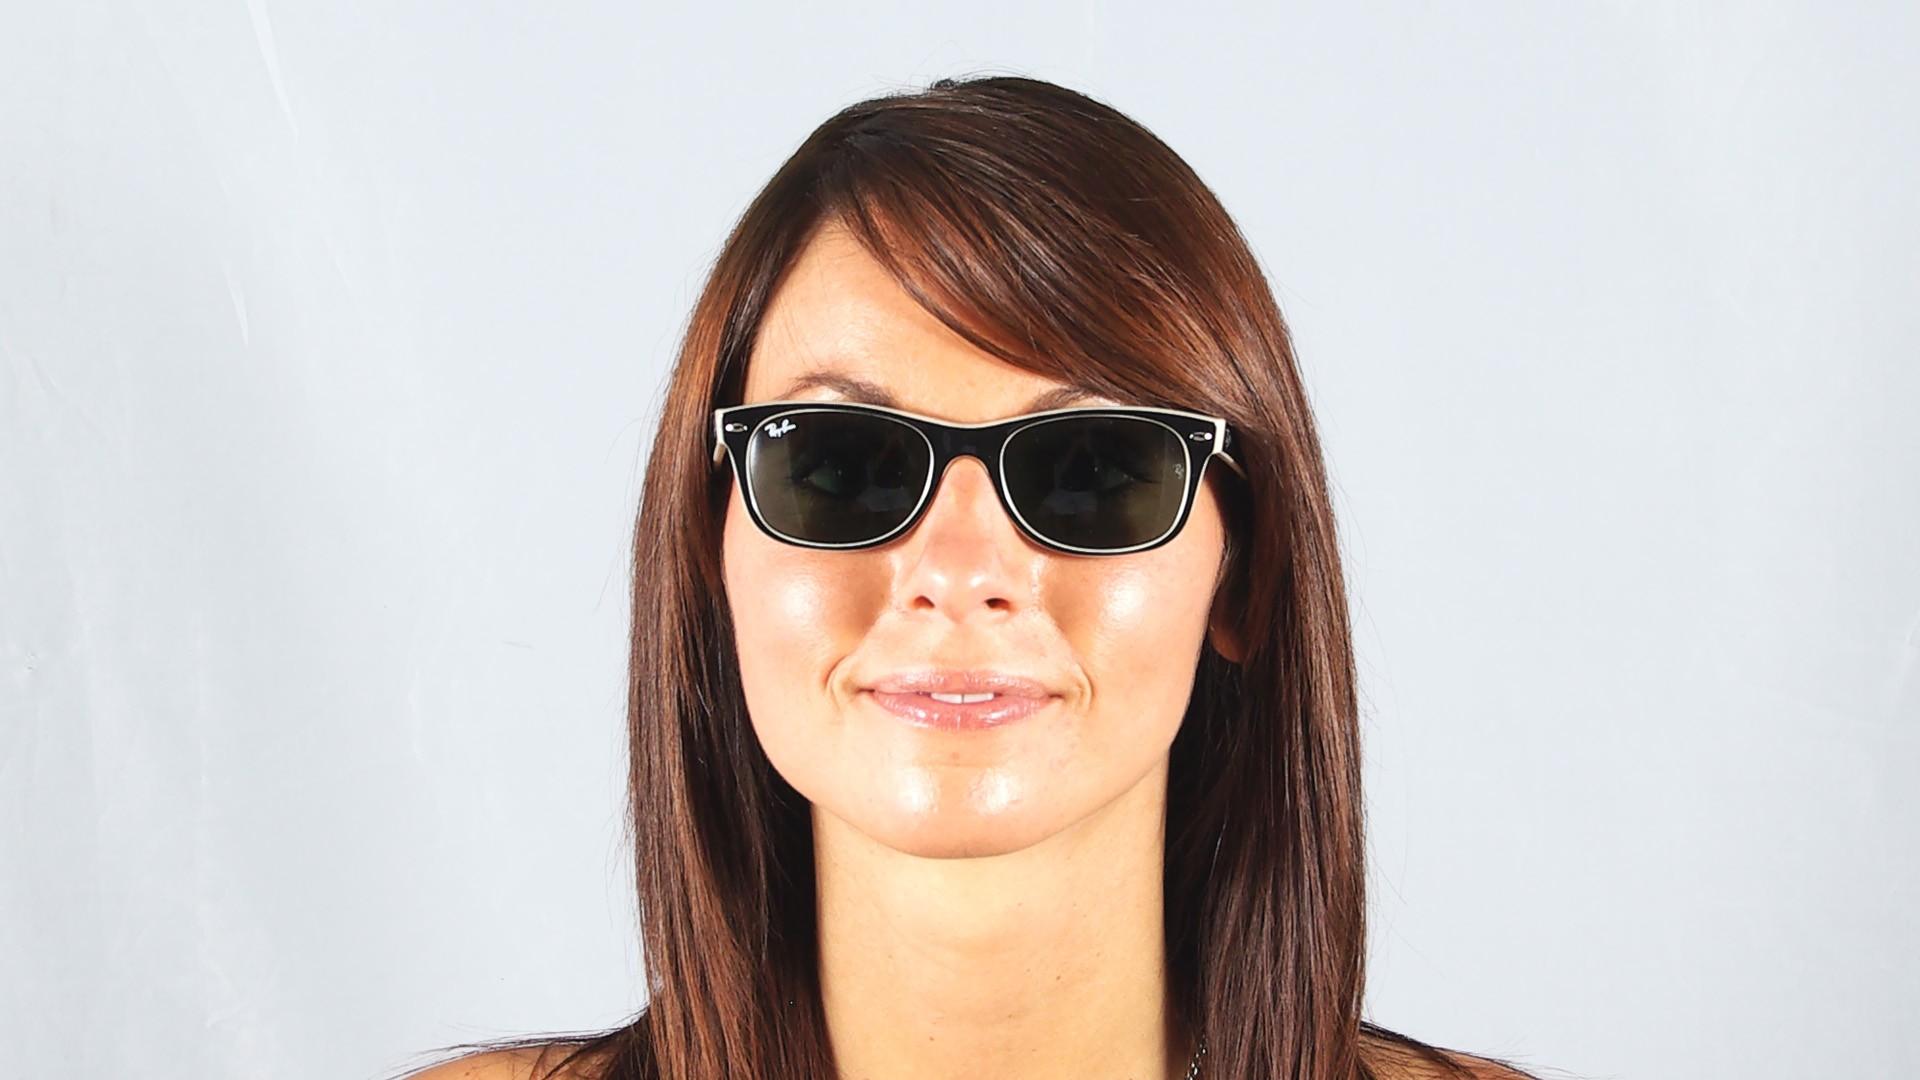 a1372ba4ea5 Sunglasses Ray-Ban New Wayfarer Black RB2132 875 52-18 Medium